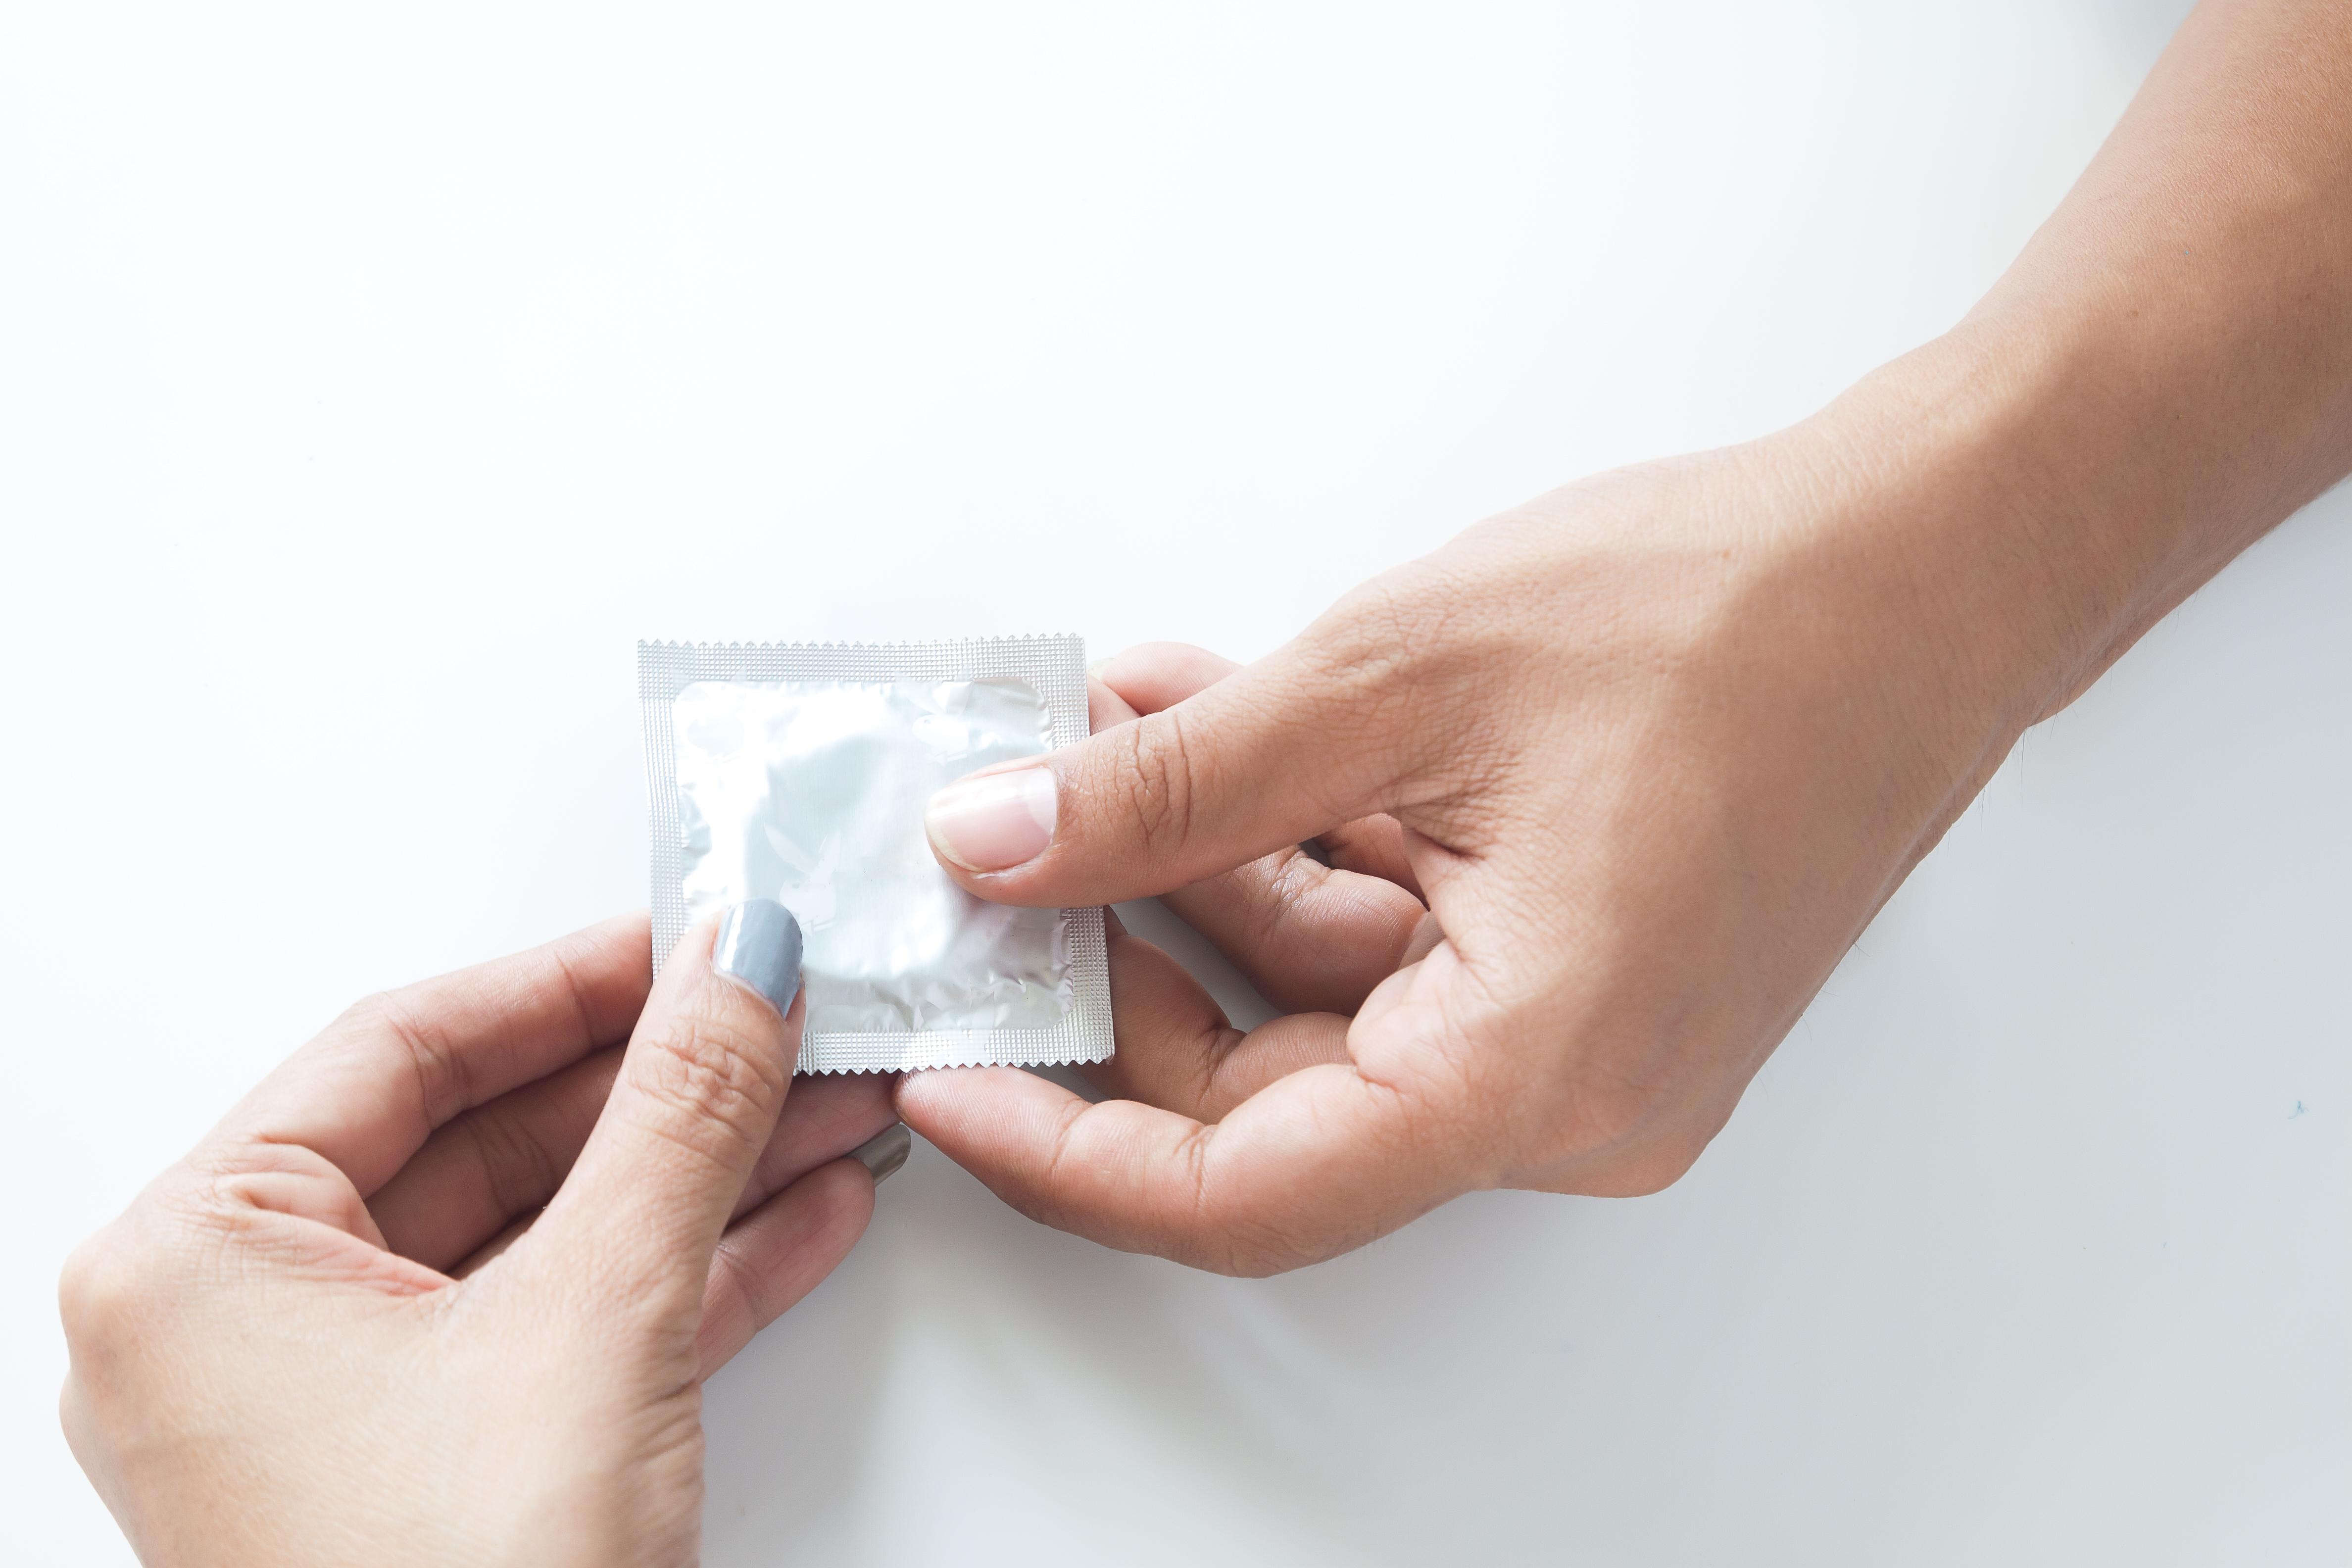 Контрацептивы для мужчин: презервативы, таблетки, импланты